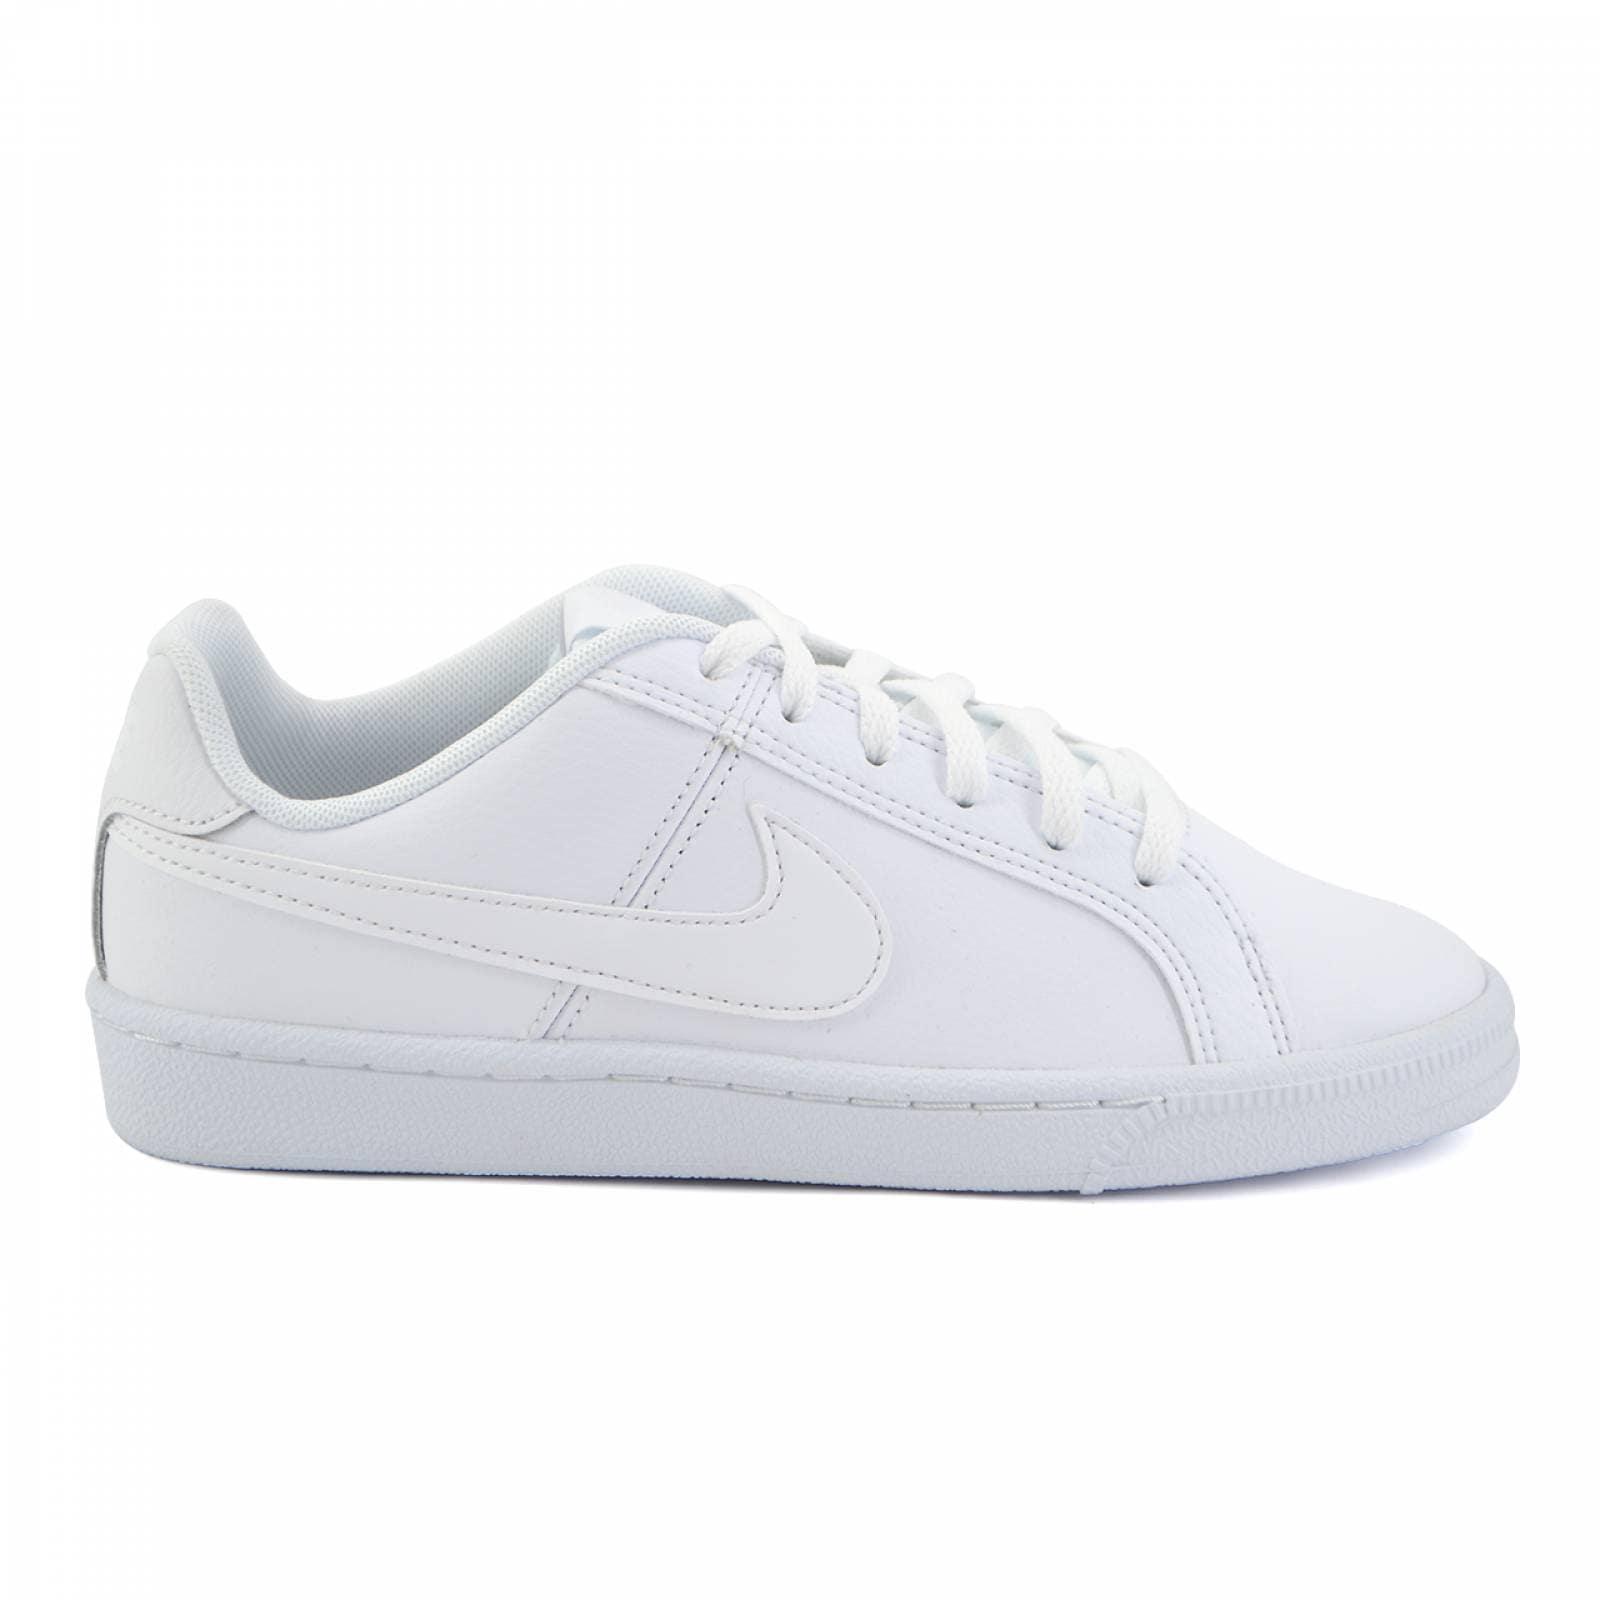 fútbol americano hoy Melodramático  Tenis Nike para Niño 833535 102 Blanco NIK2107